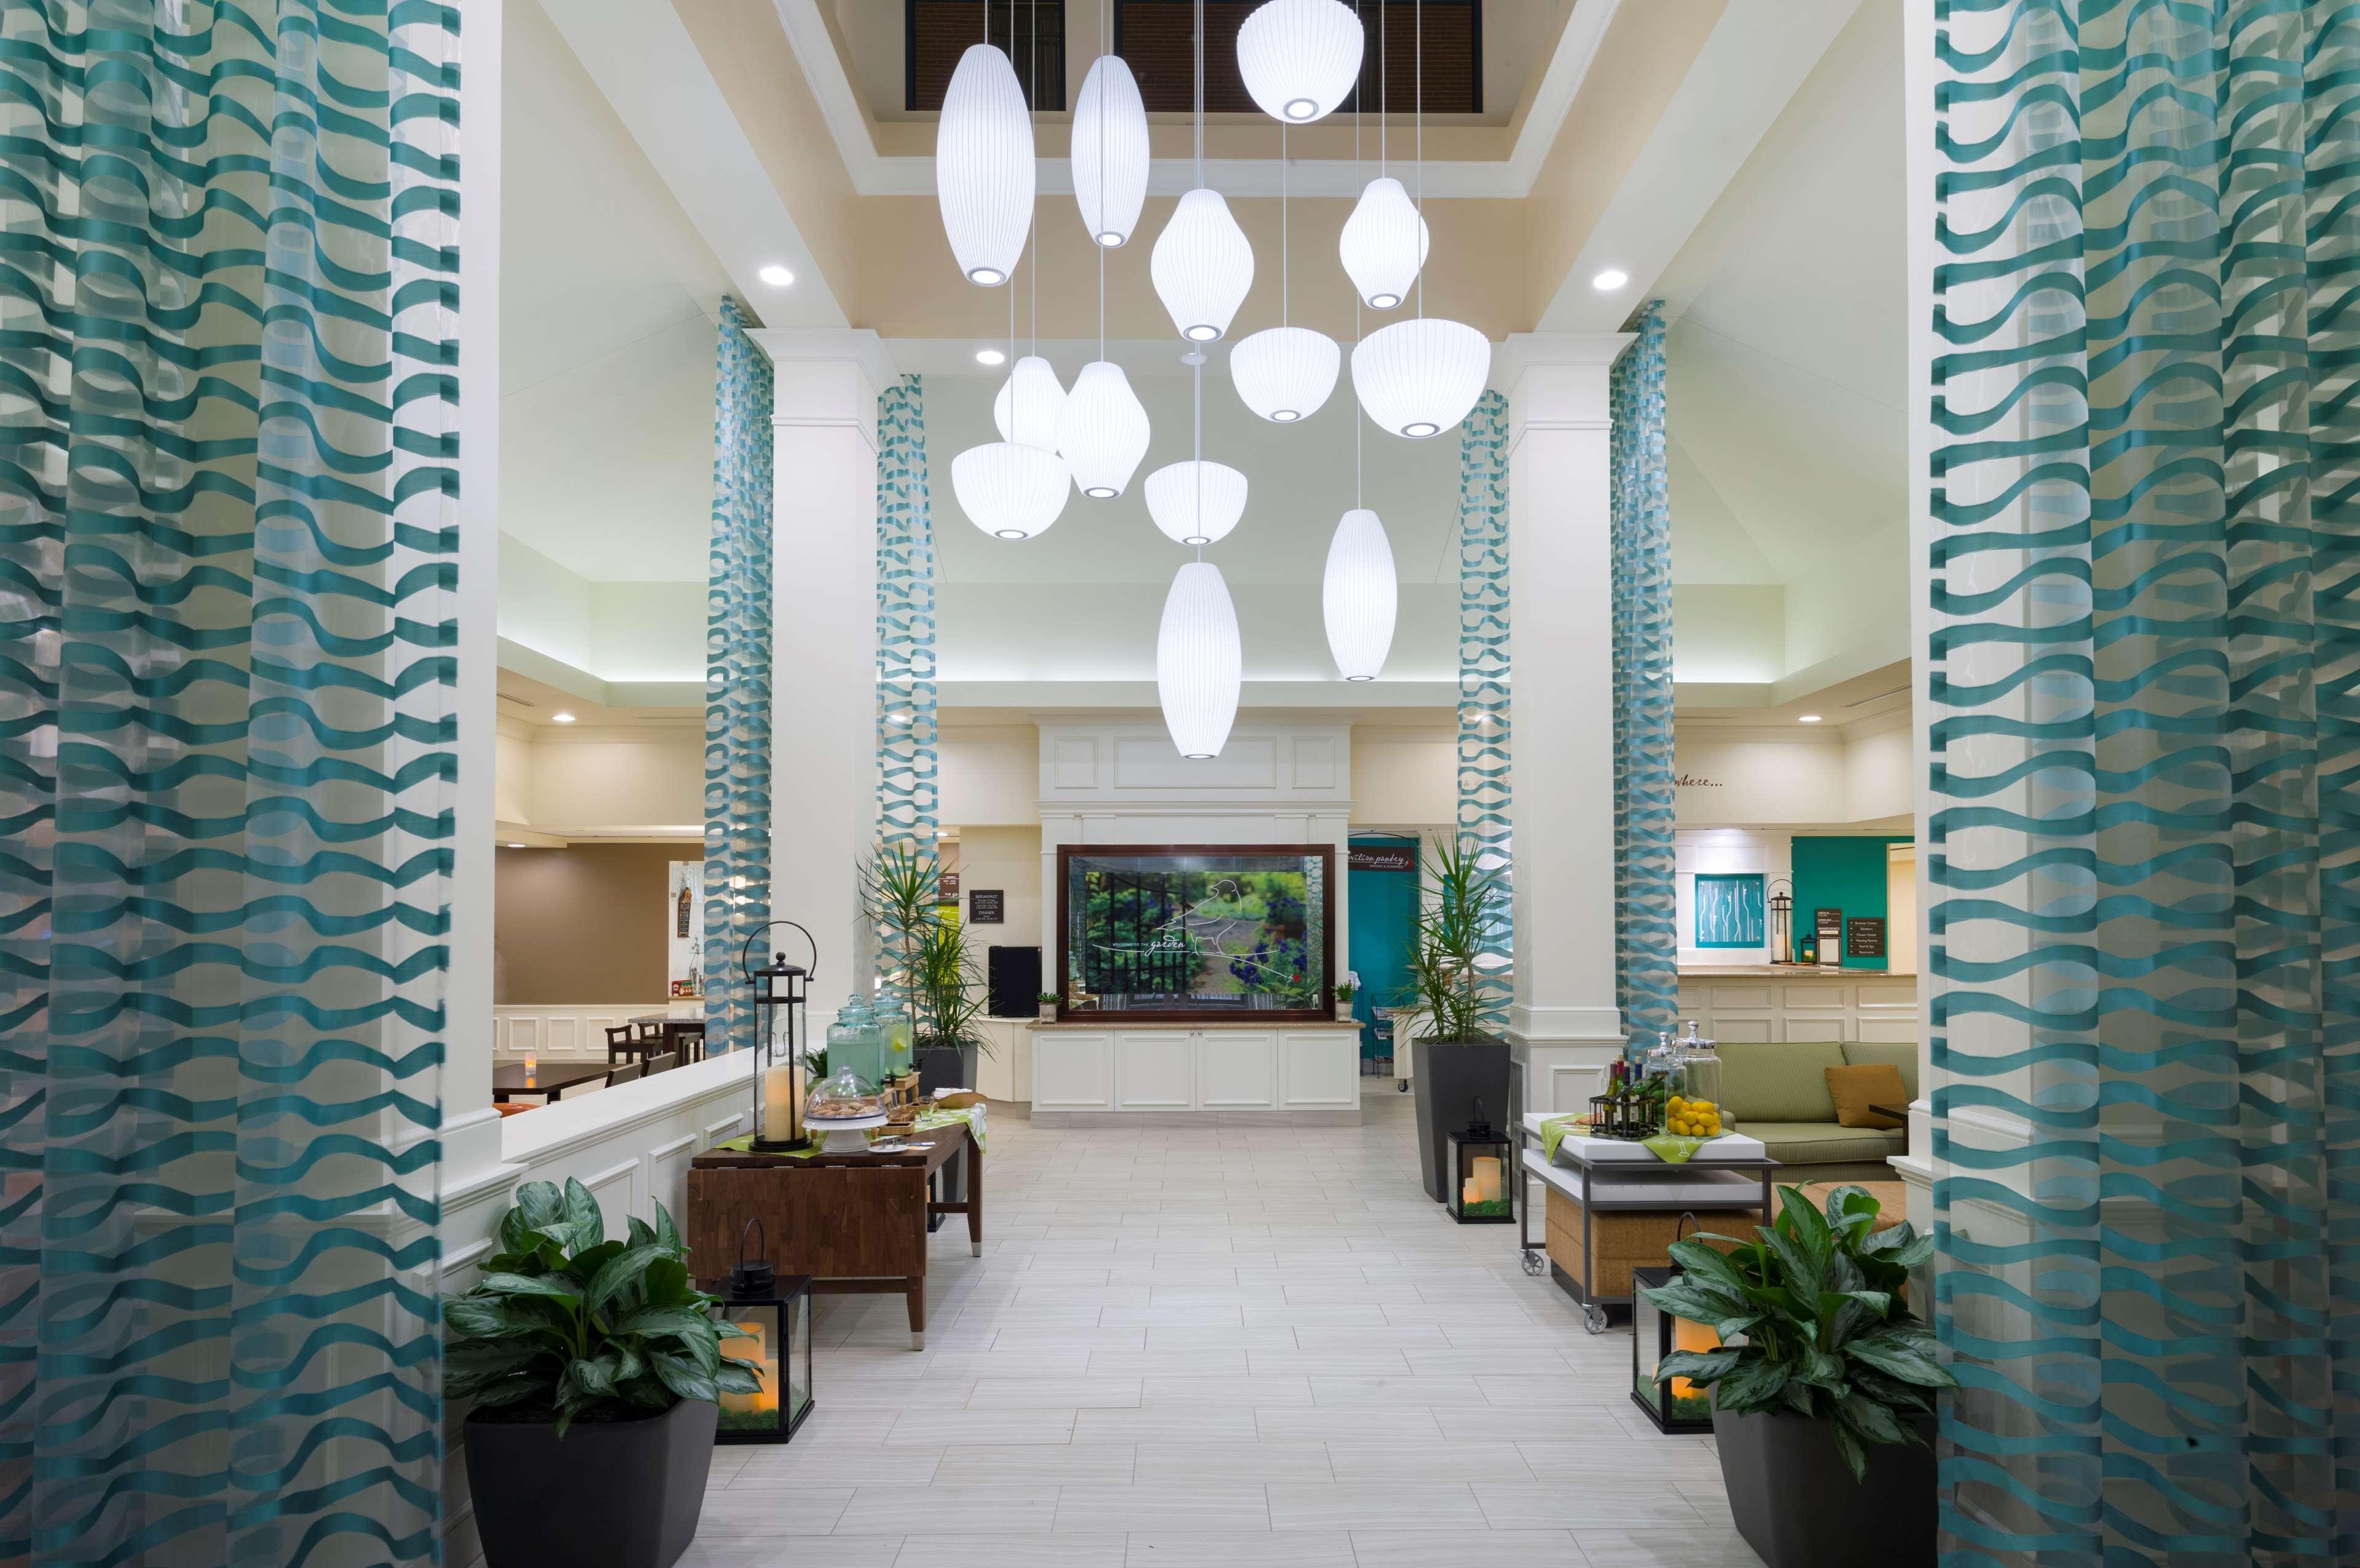 Hilton Garden Inn Hartford South/Glastonbury image 6